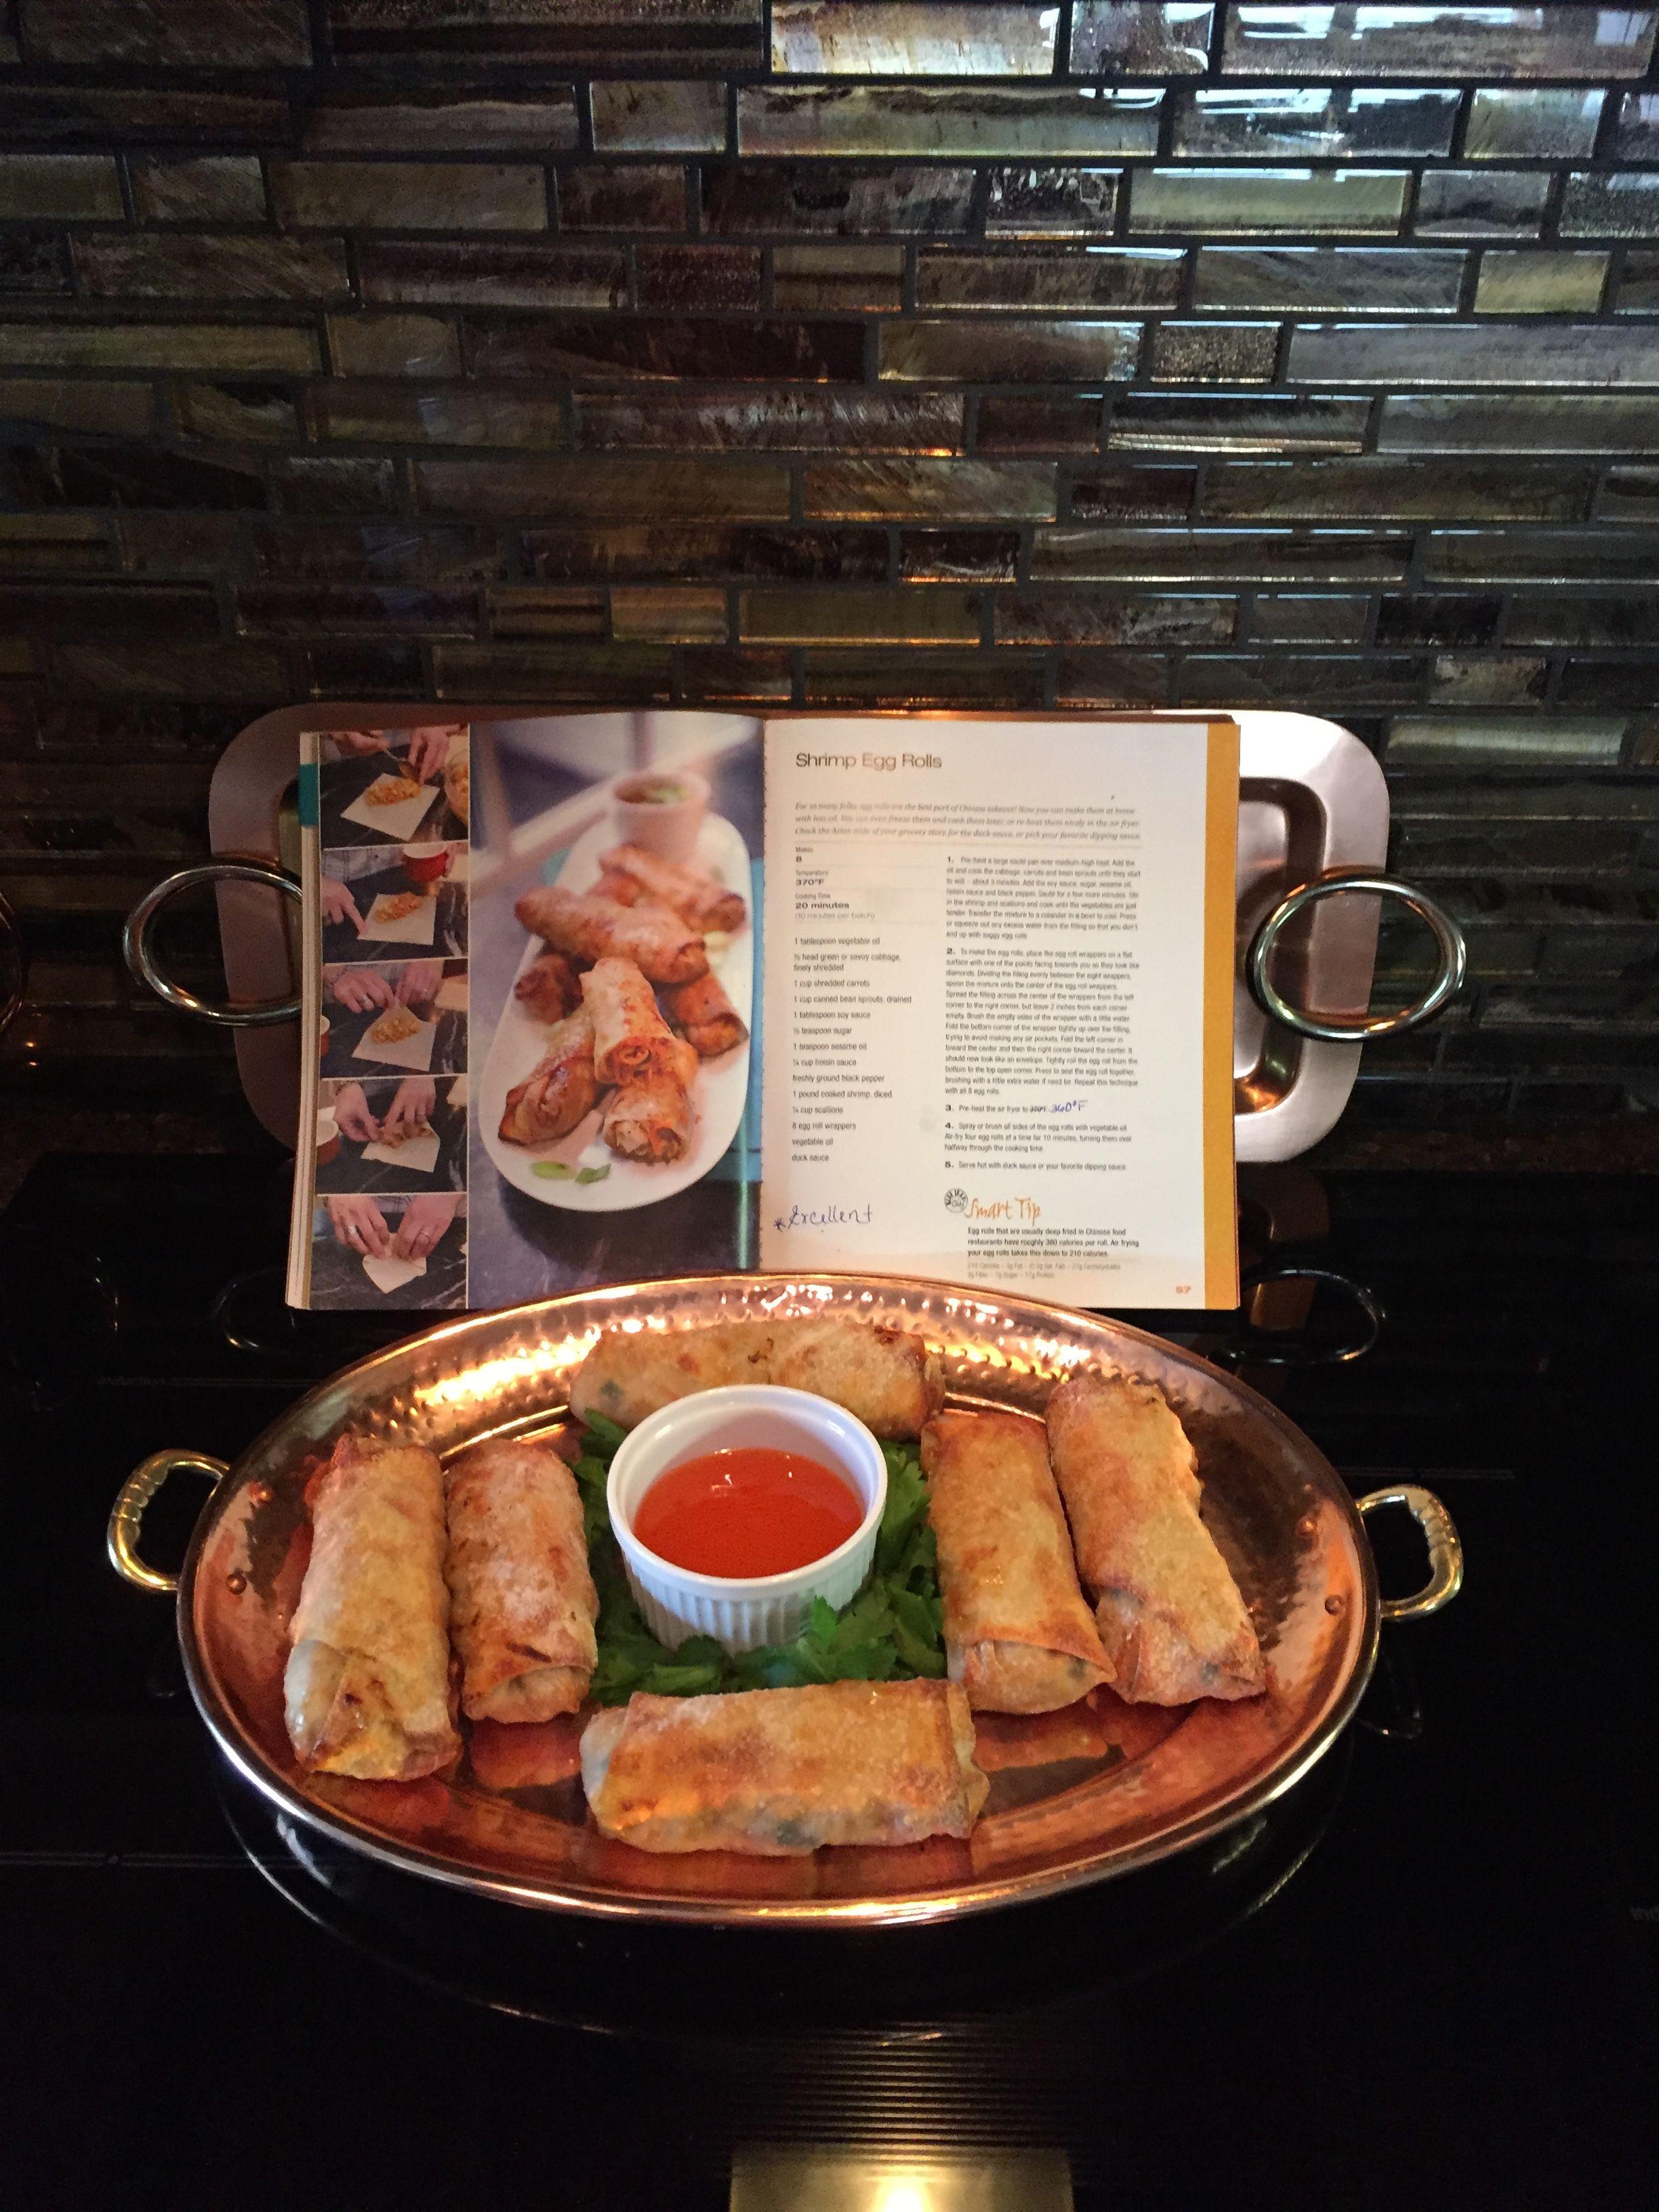 Air Fried Shrimp Egg Rolls Air fryer recipes, Cooks air